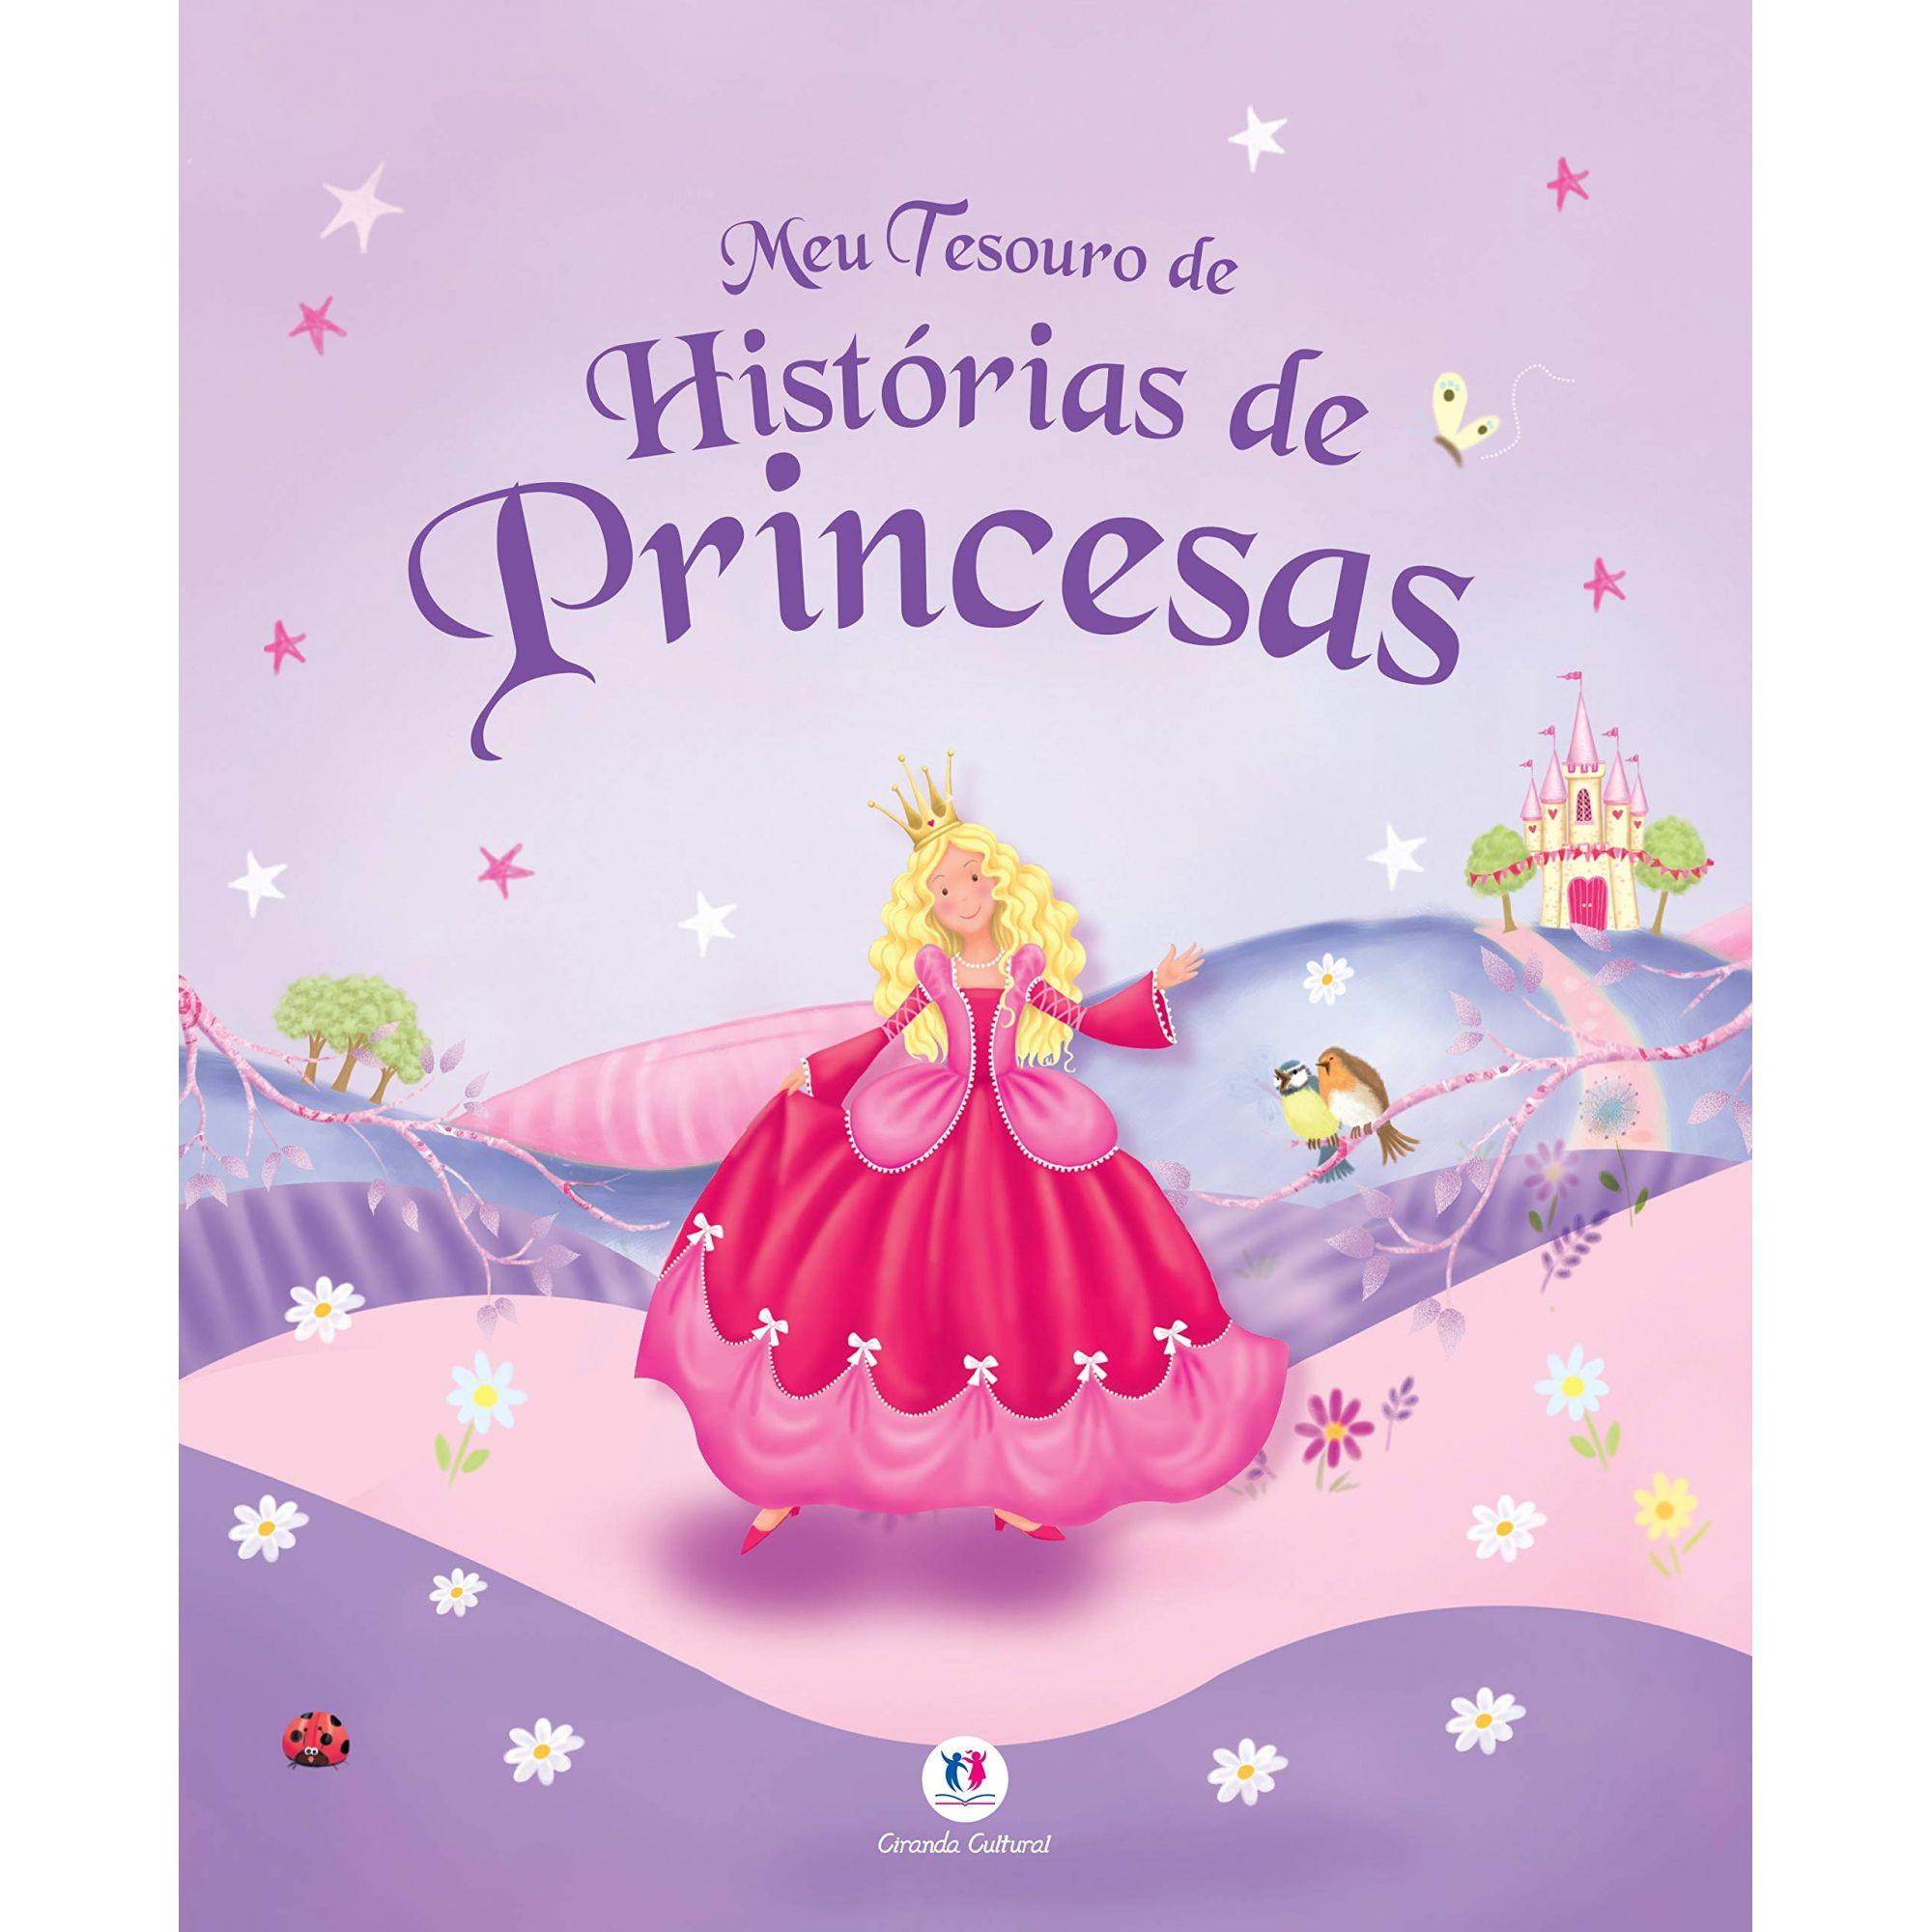 MEU TESOURO DE HISTORIAS DE PRINCESAS